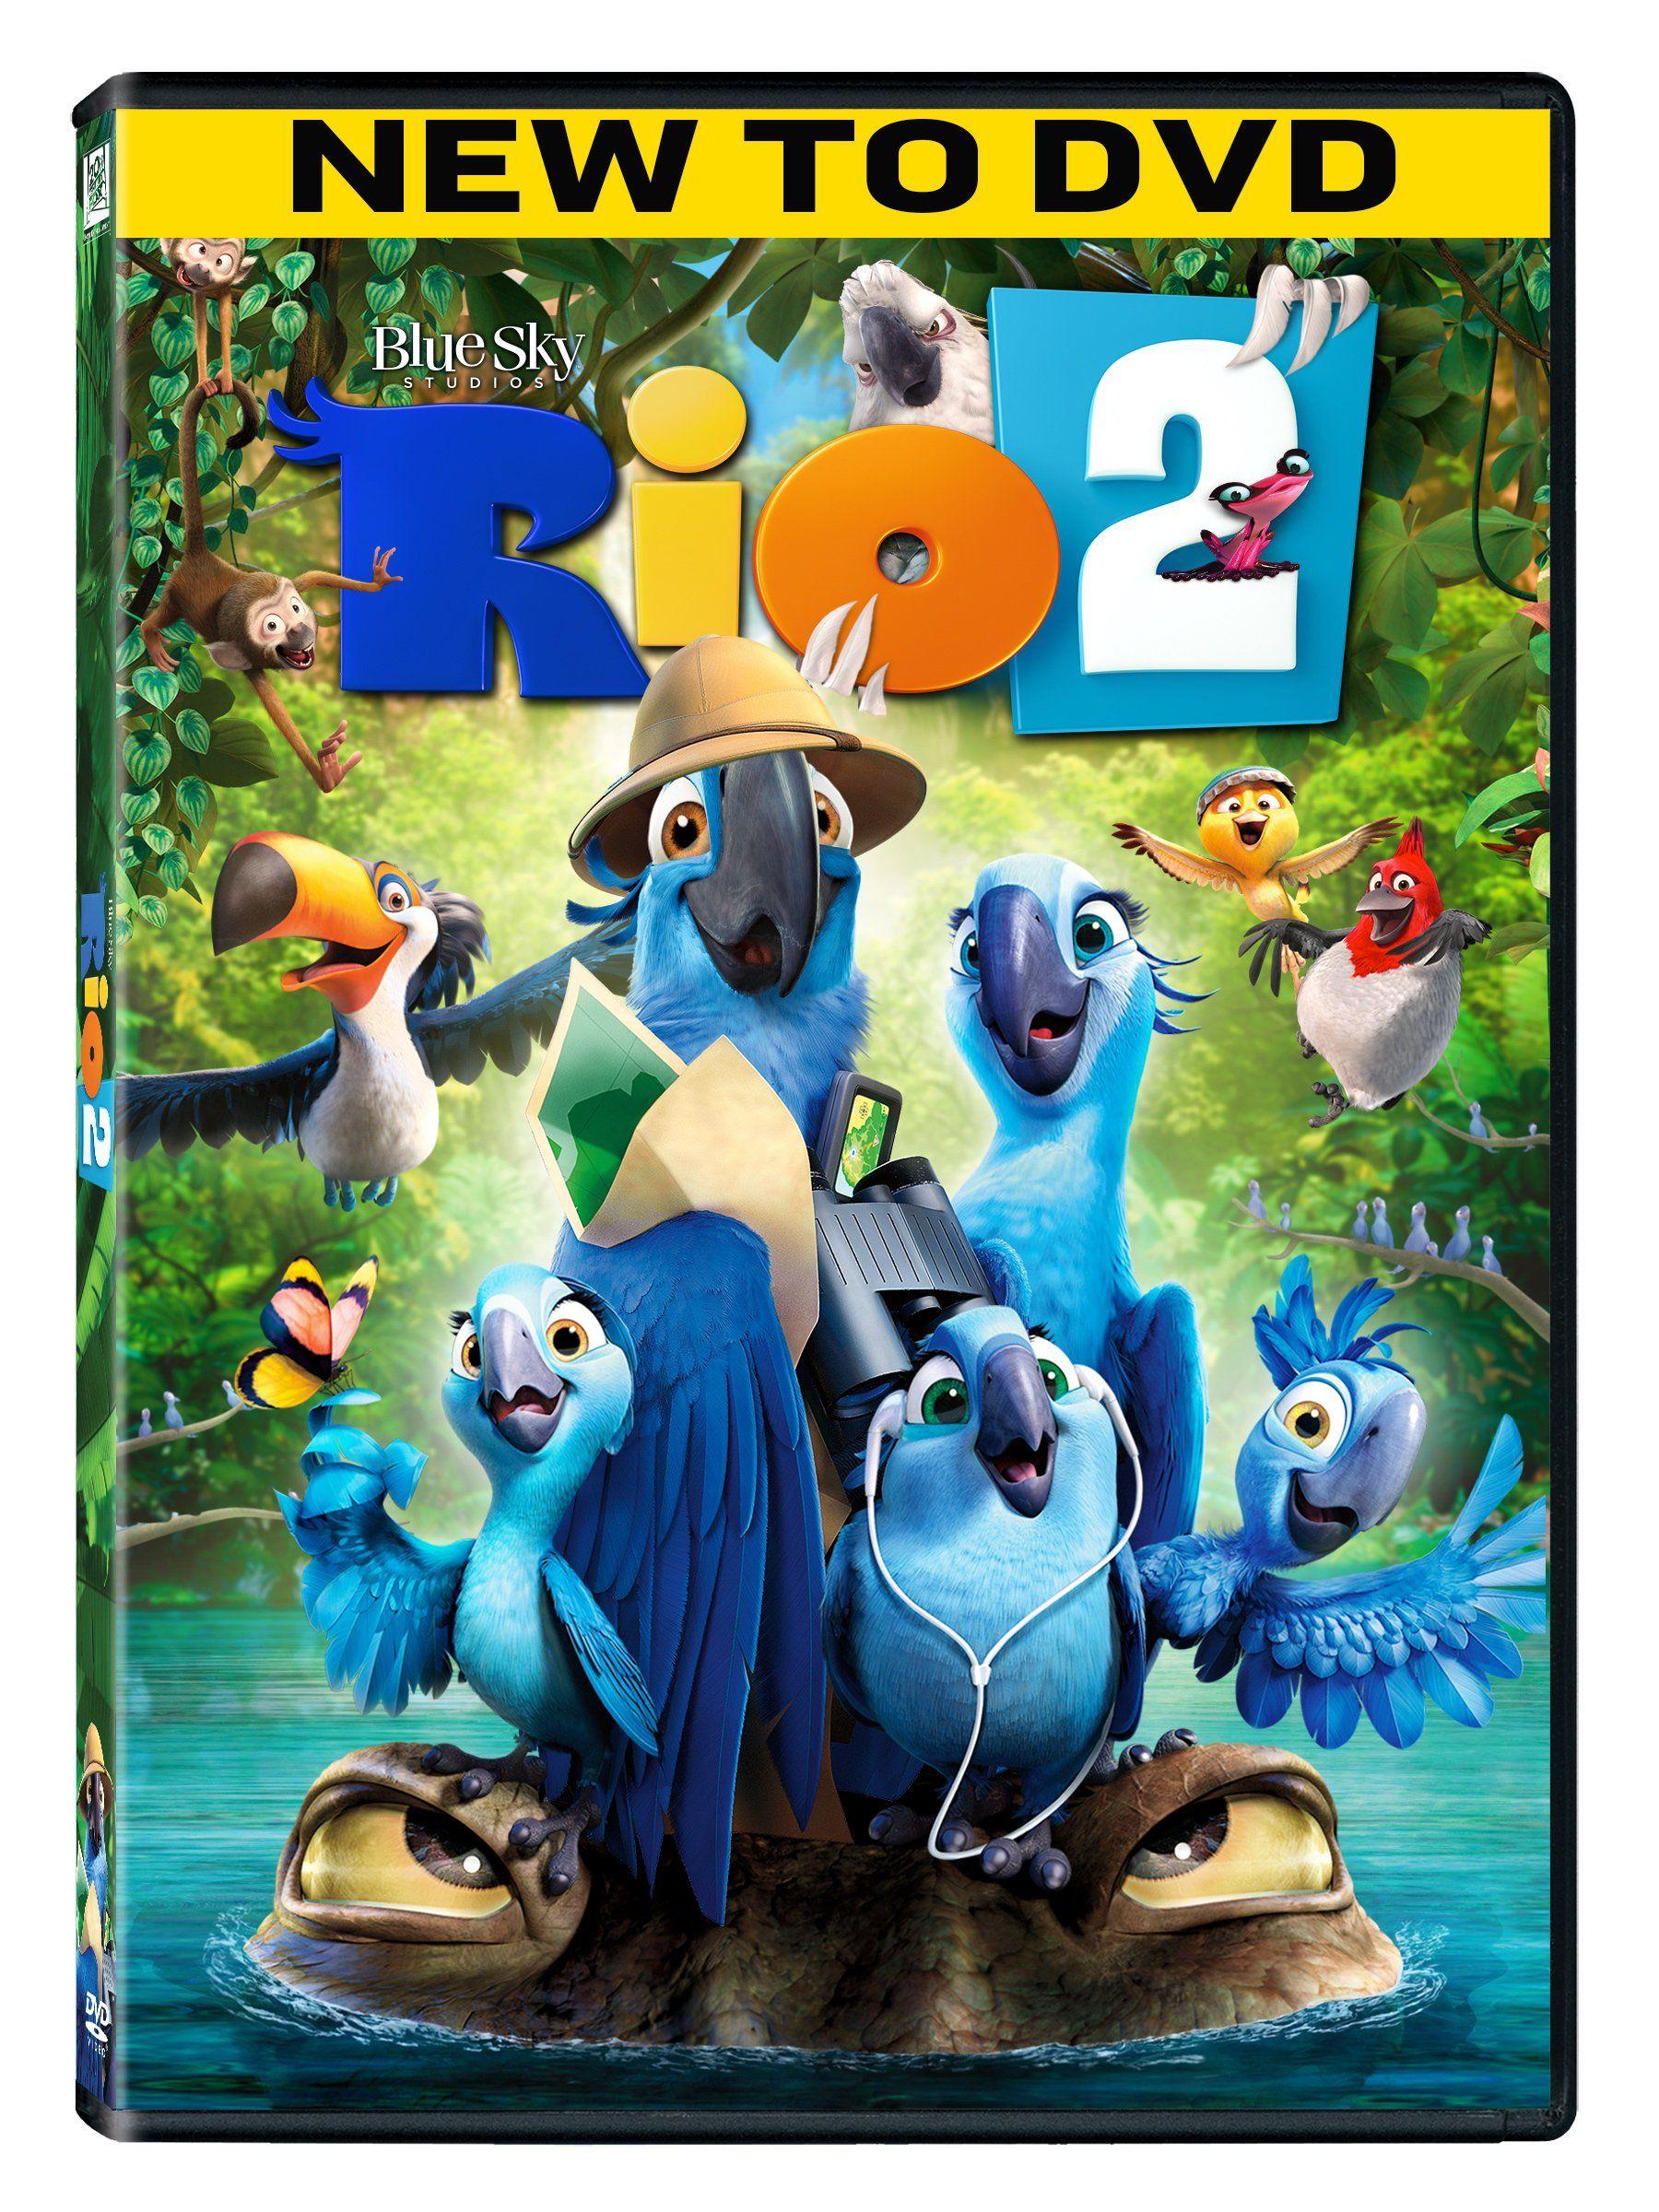 Amazon Com Rio 2 Jesse Eisenberg Anne Hathaway Jemaine Clement Carlos Saldanha Movies Tv Peliculas Infantiles Peliculas Completas Peliculas